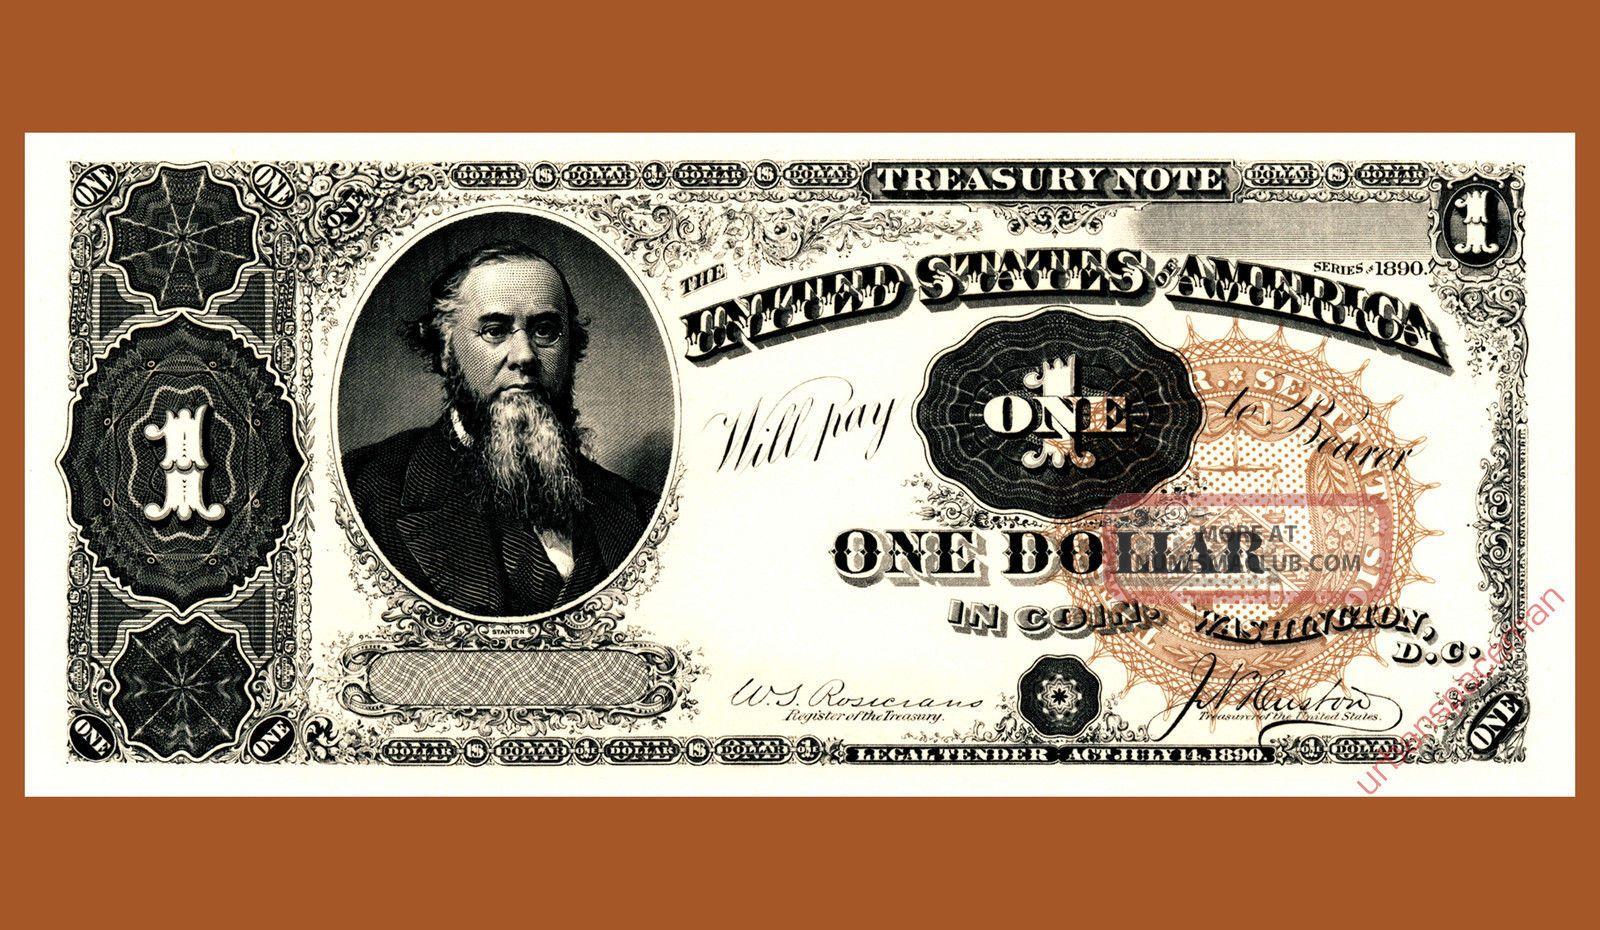 B196 Ipms 1995 Bep Souvenir Card $1 Treasury Note 1890 Face Stanton Paper Money: US photo